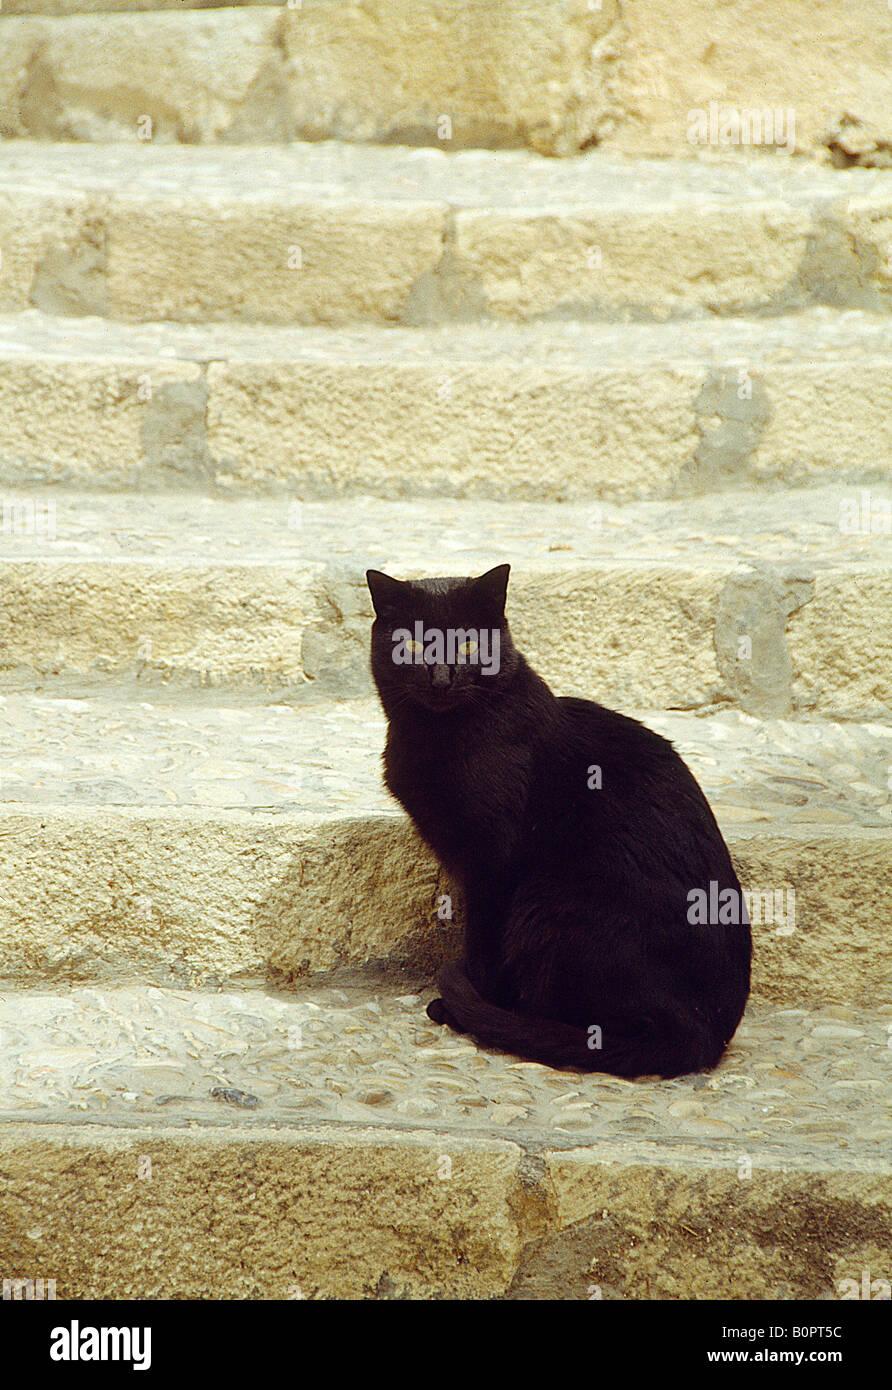 Black cat sitting on stairs Stock Photo - Alamy